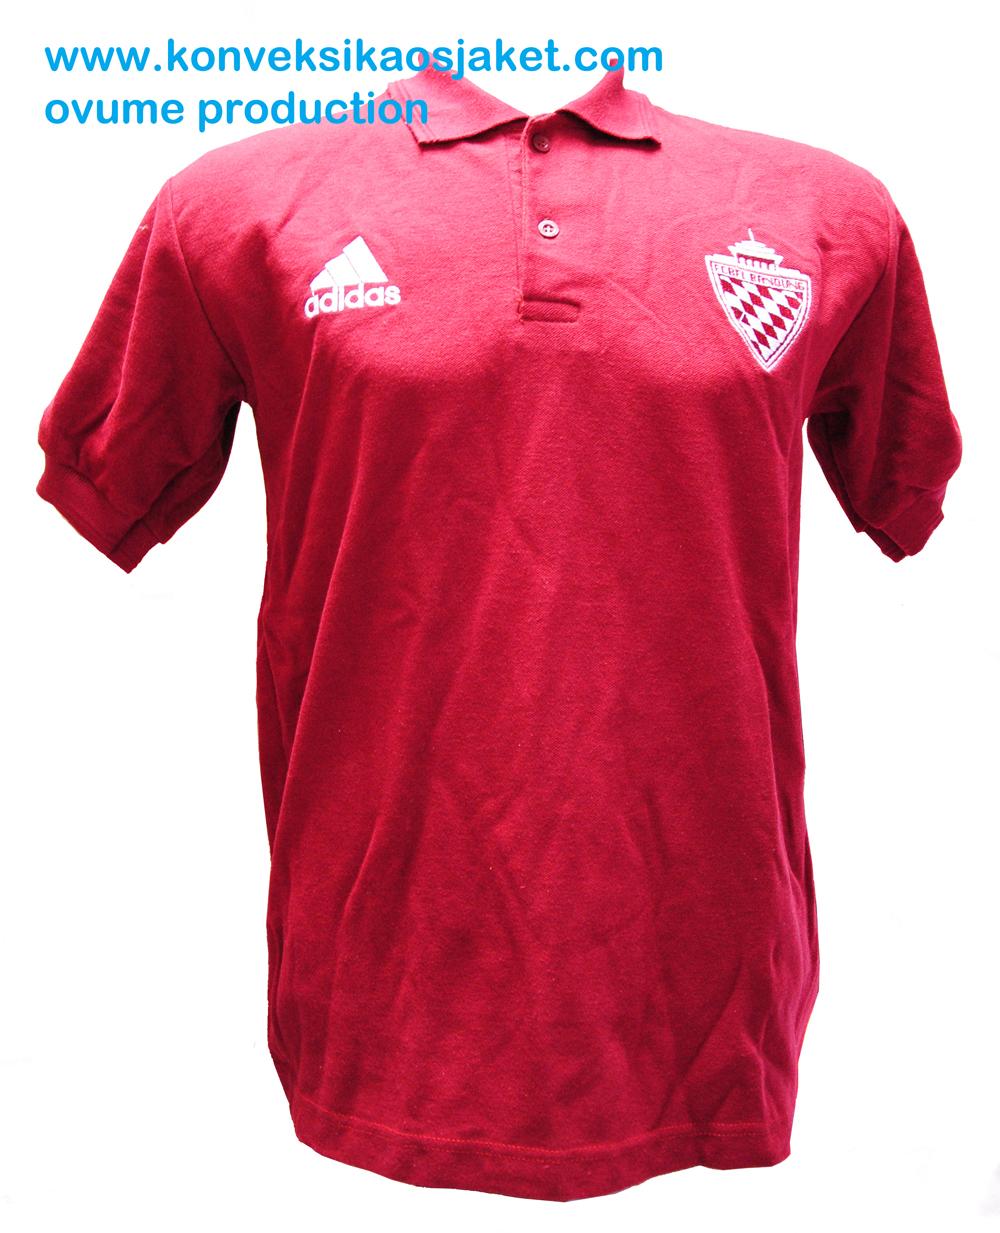 https://i2.wp.com/1.bp.blogspot.com/-pdmb2xM8LWk/UQcAxBYYepI/AAAAAAAAA1I/0Uq4AzFKGG4/s1600/polo+shirt+FCBI+-+Copy.jpg?resize=463%2C583